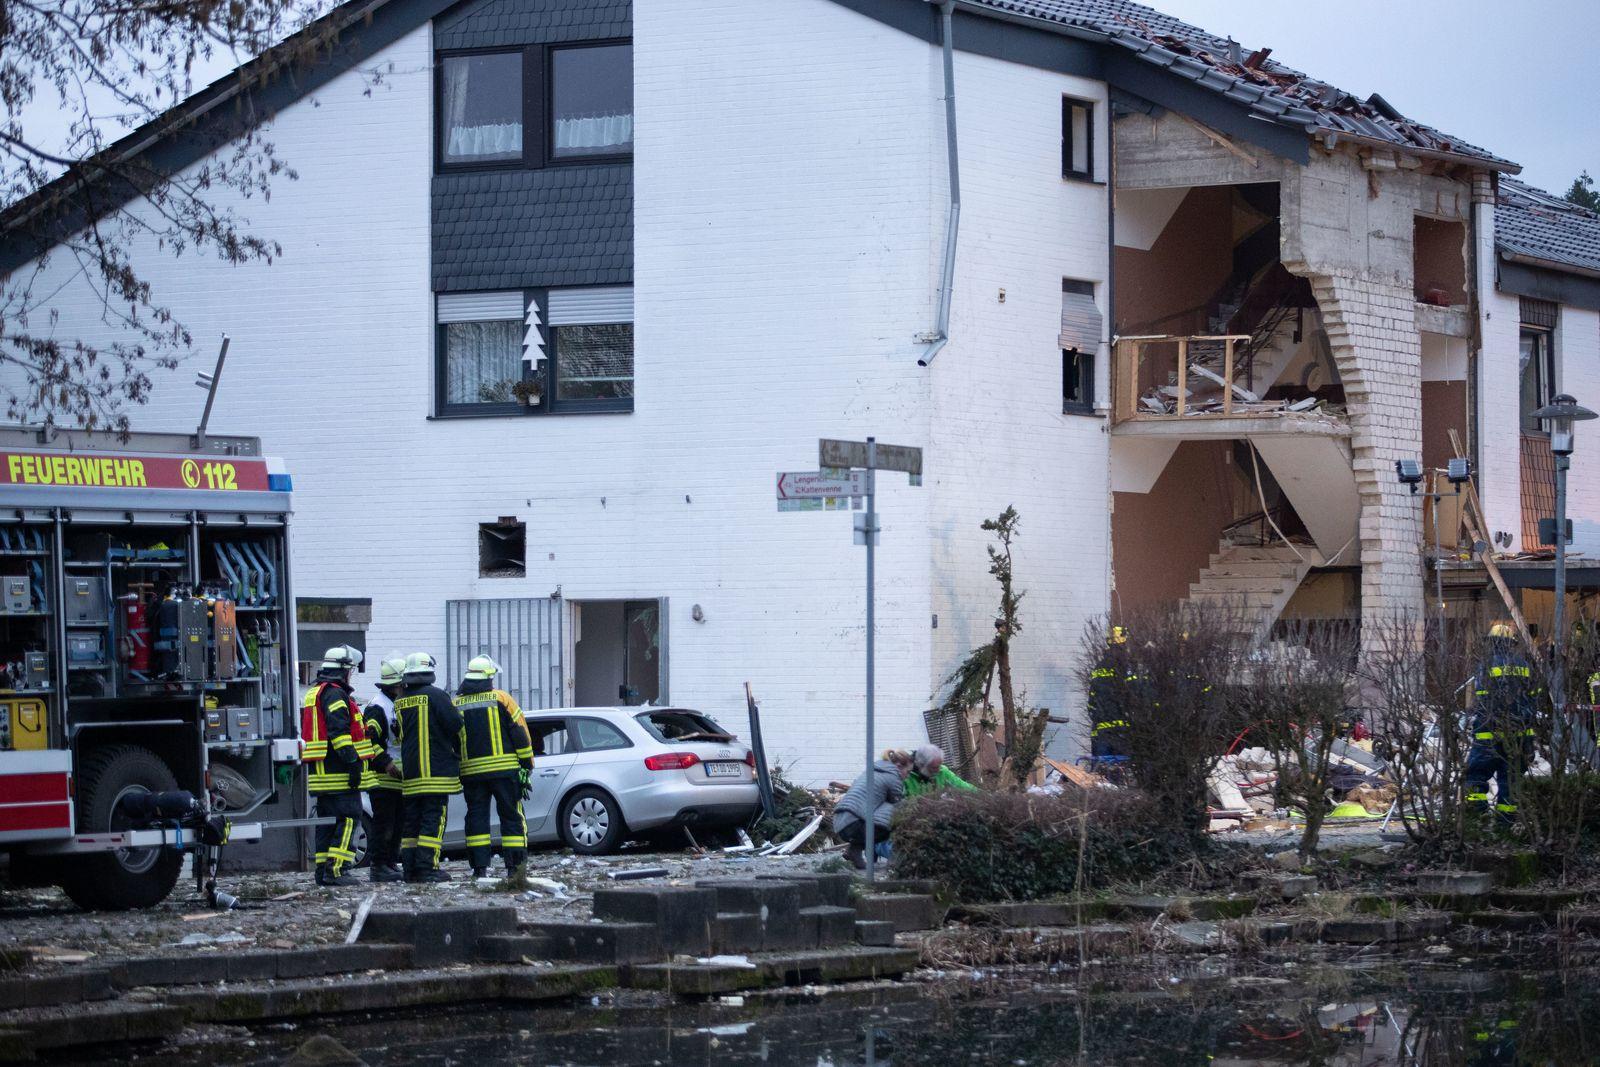 Gasexplosion in Mehrfamilienhaus